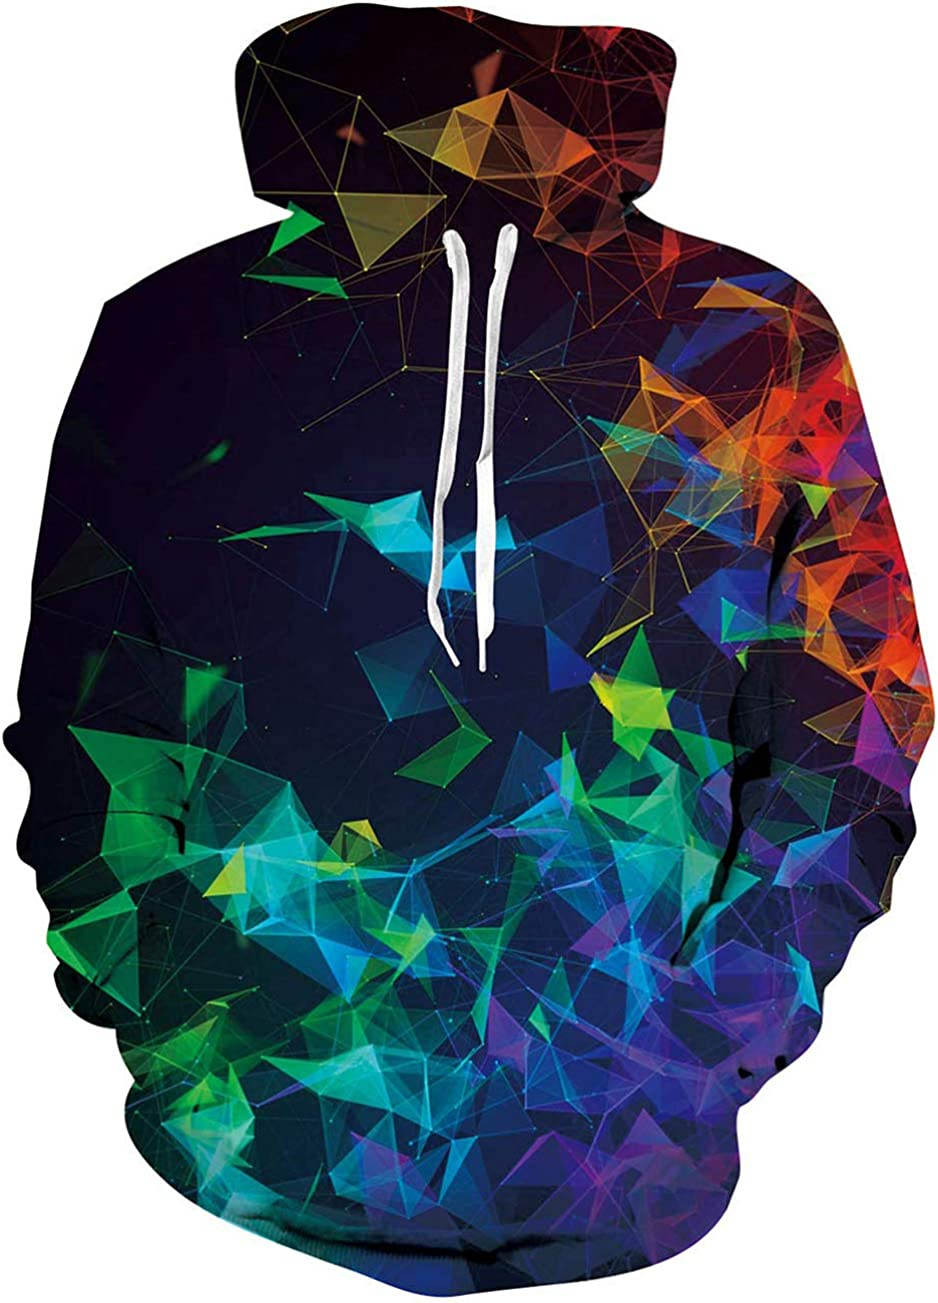 Loveternal Unisex Felpa con Cappuccio Stampato 3D Hoodie Tasche Coulisse Casual Sweatshirt